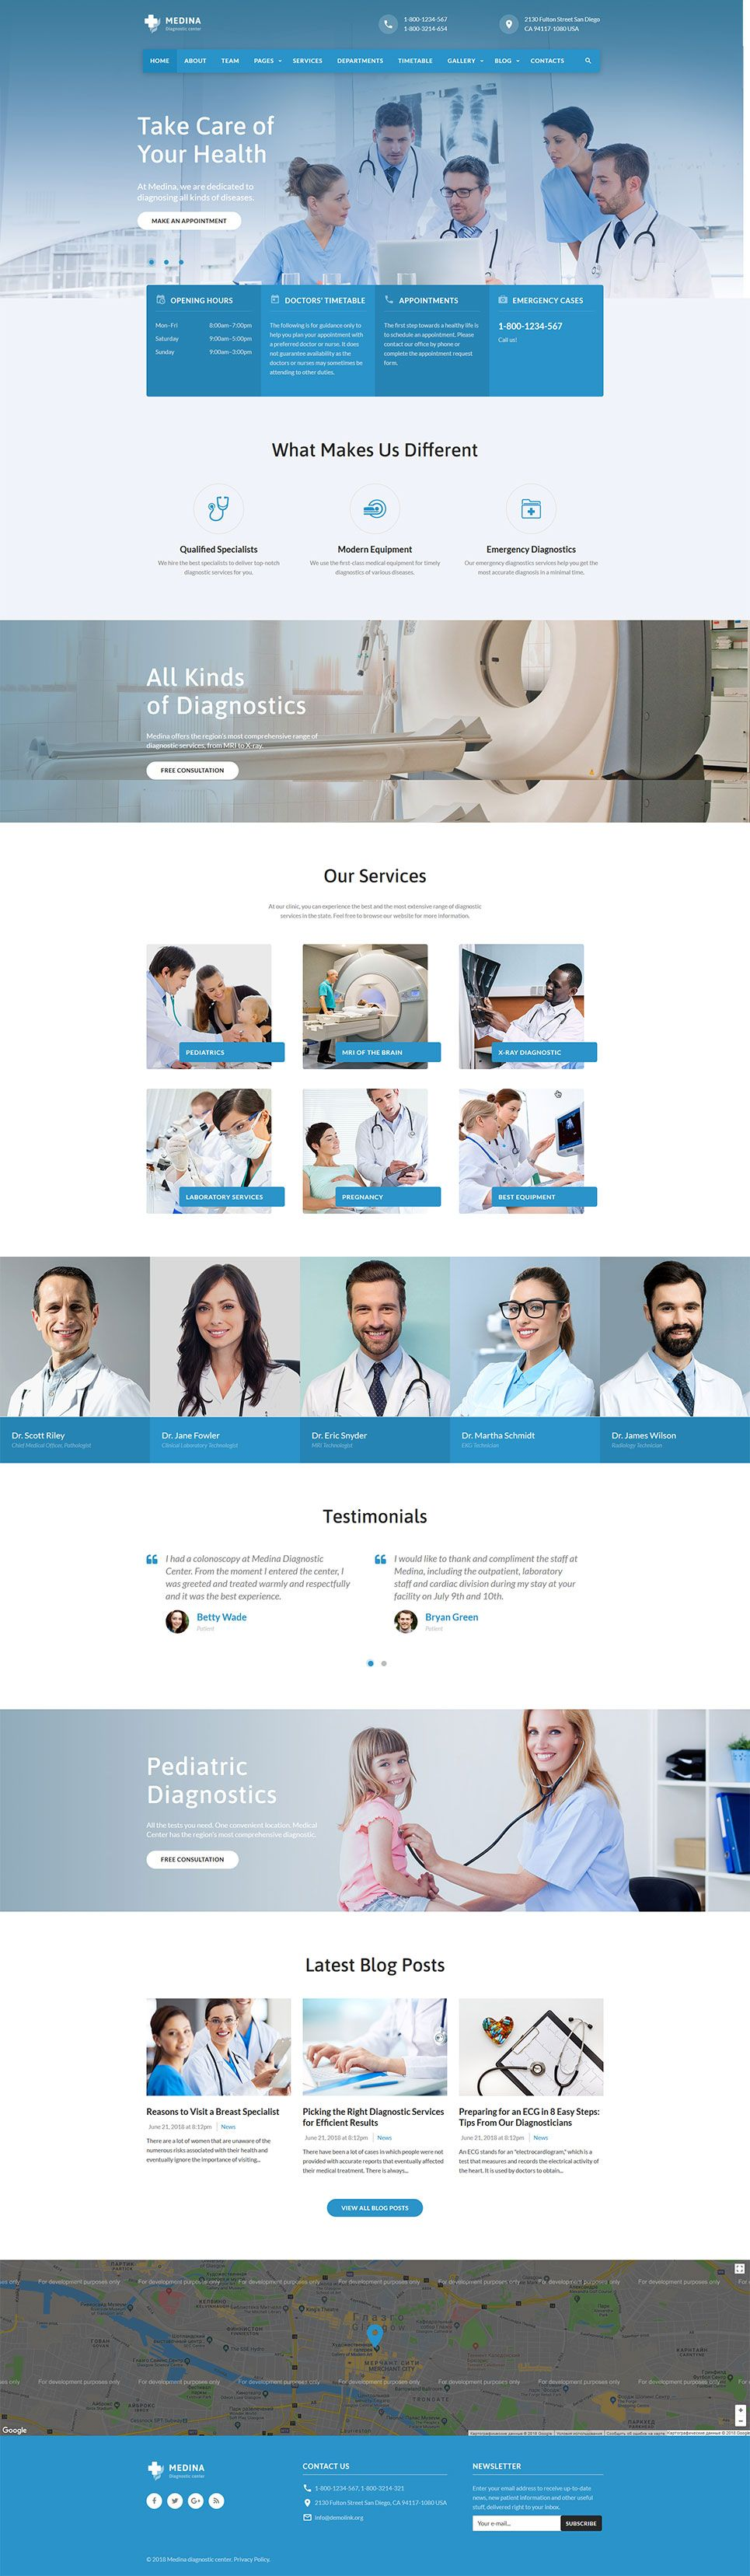 Medical diagnostic center website template for clinics